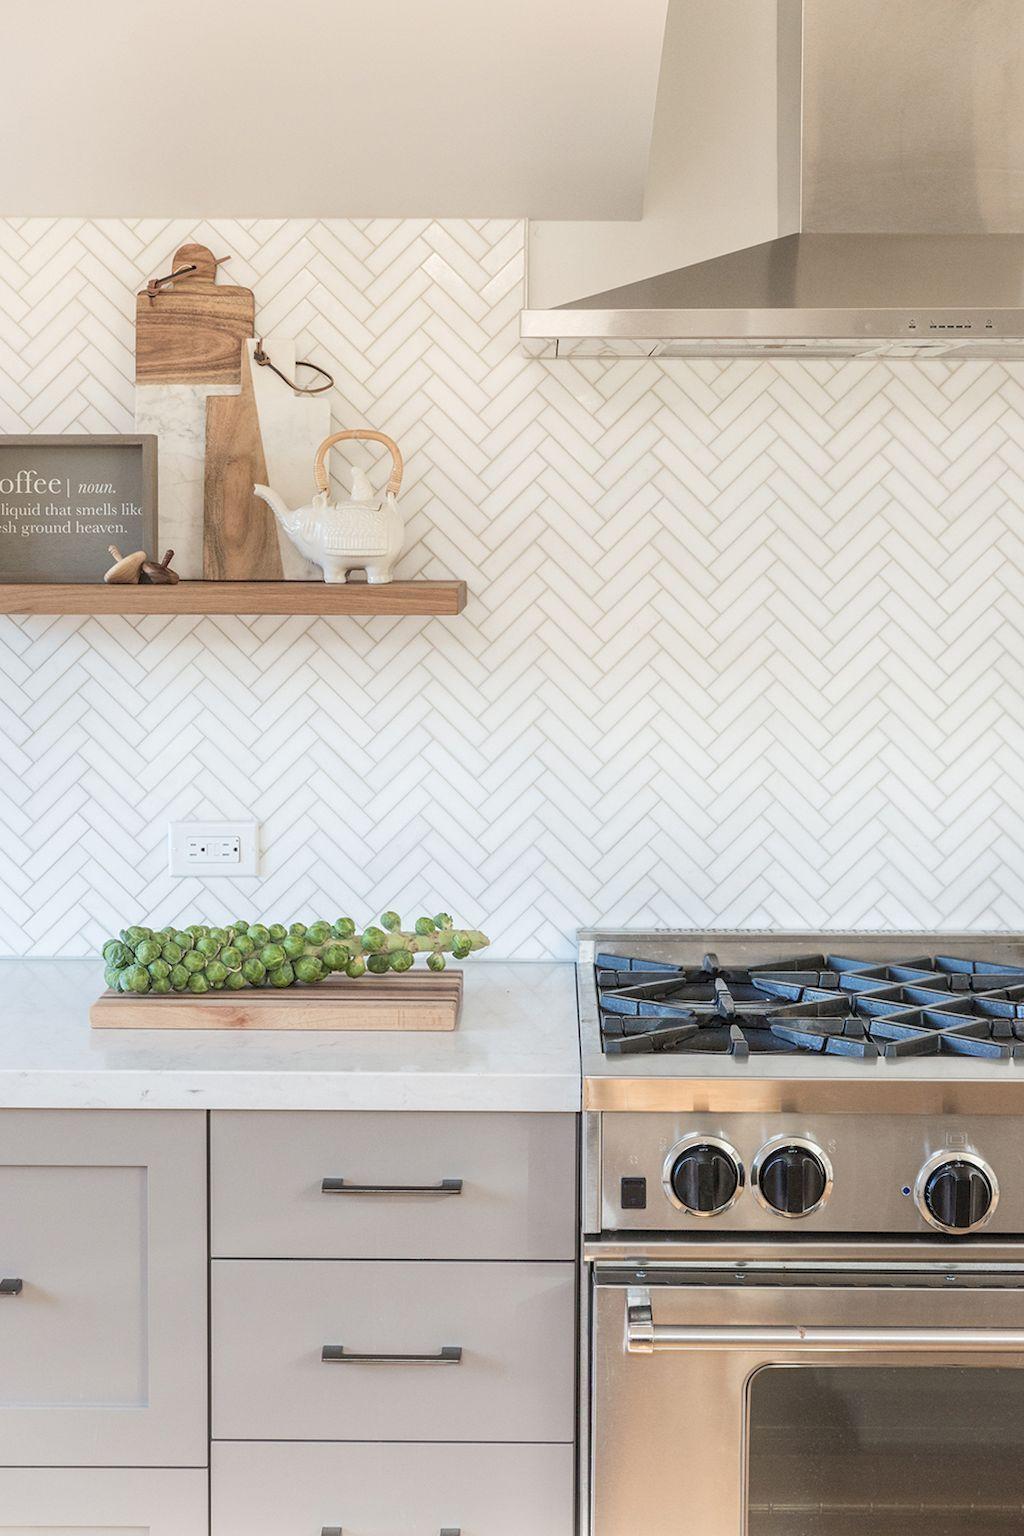 60 Beautiful Kitchen Backsplash Tile Patterns Ideas | Tile patterns ...